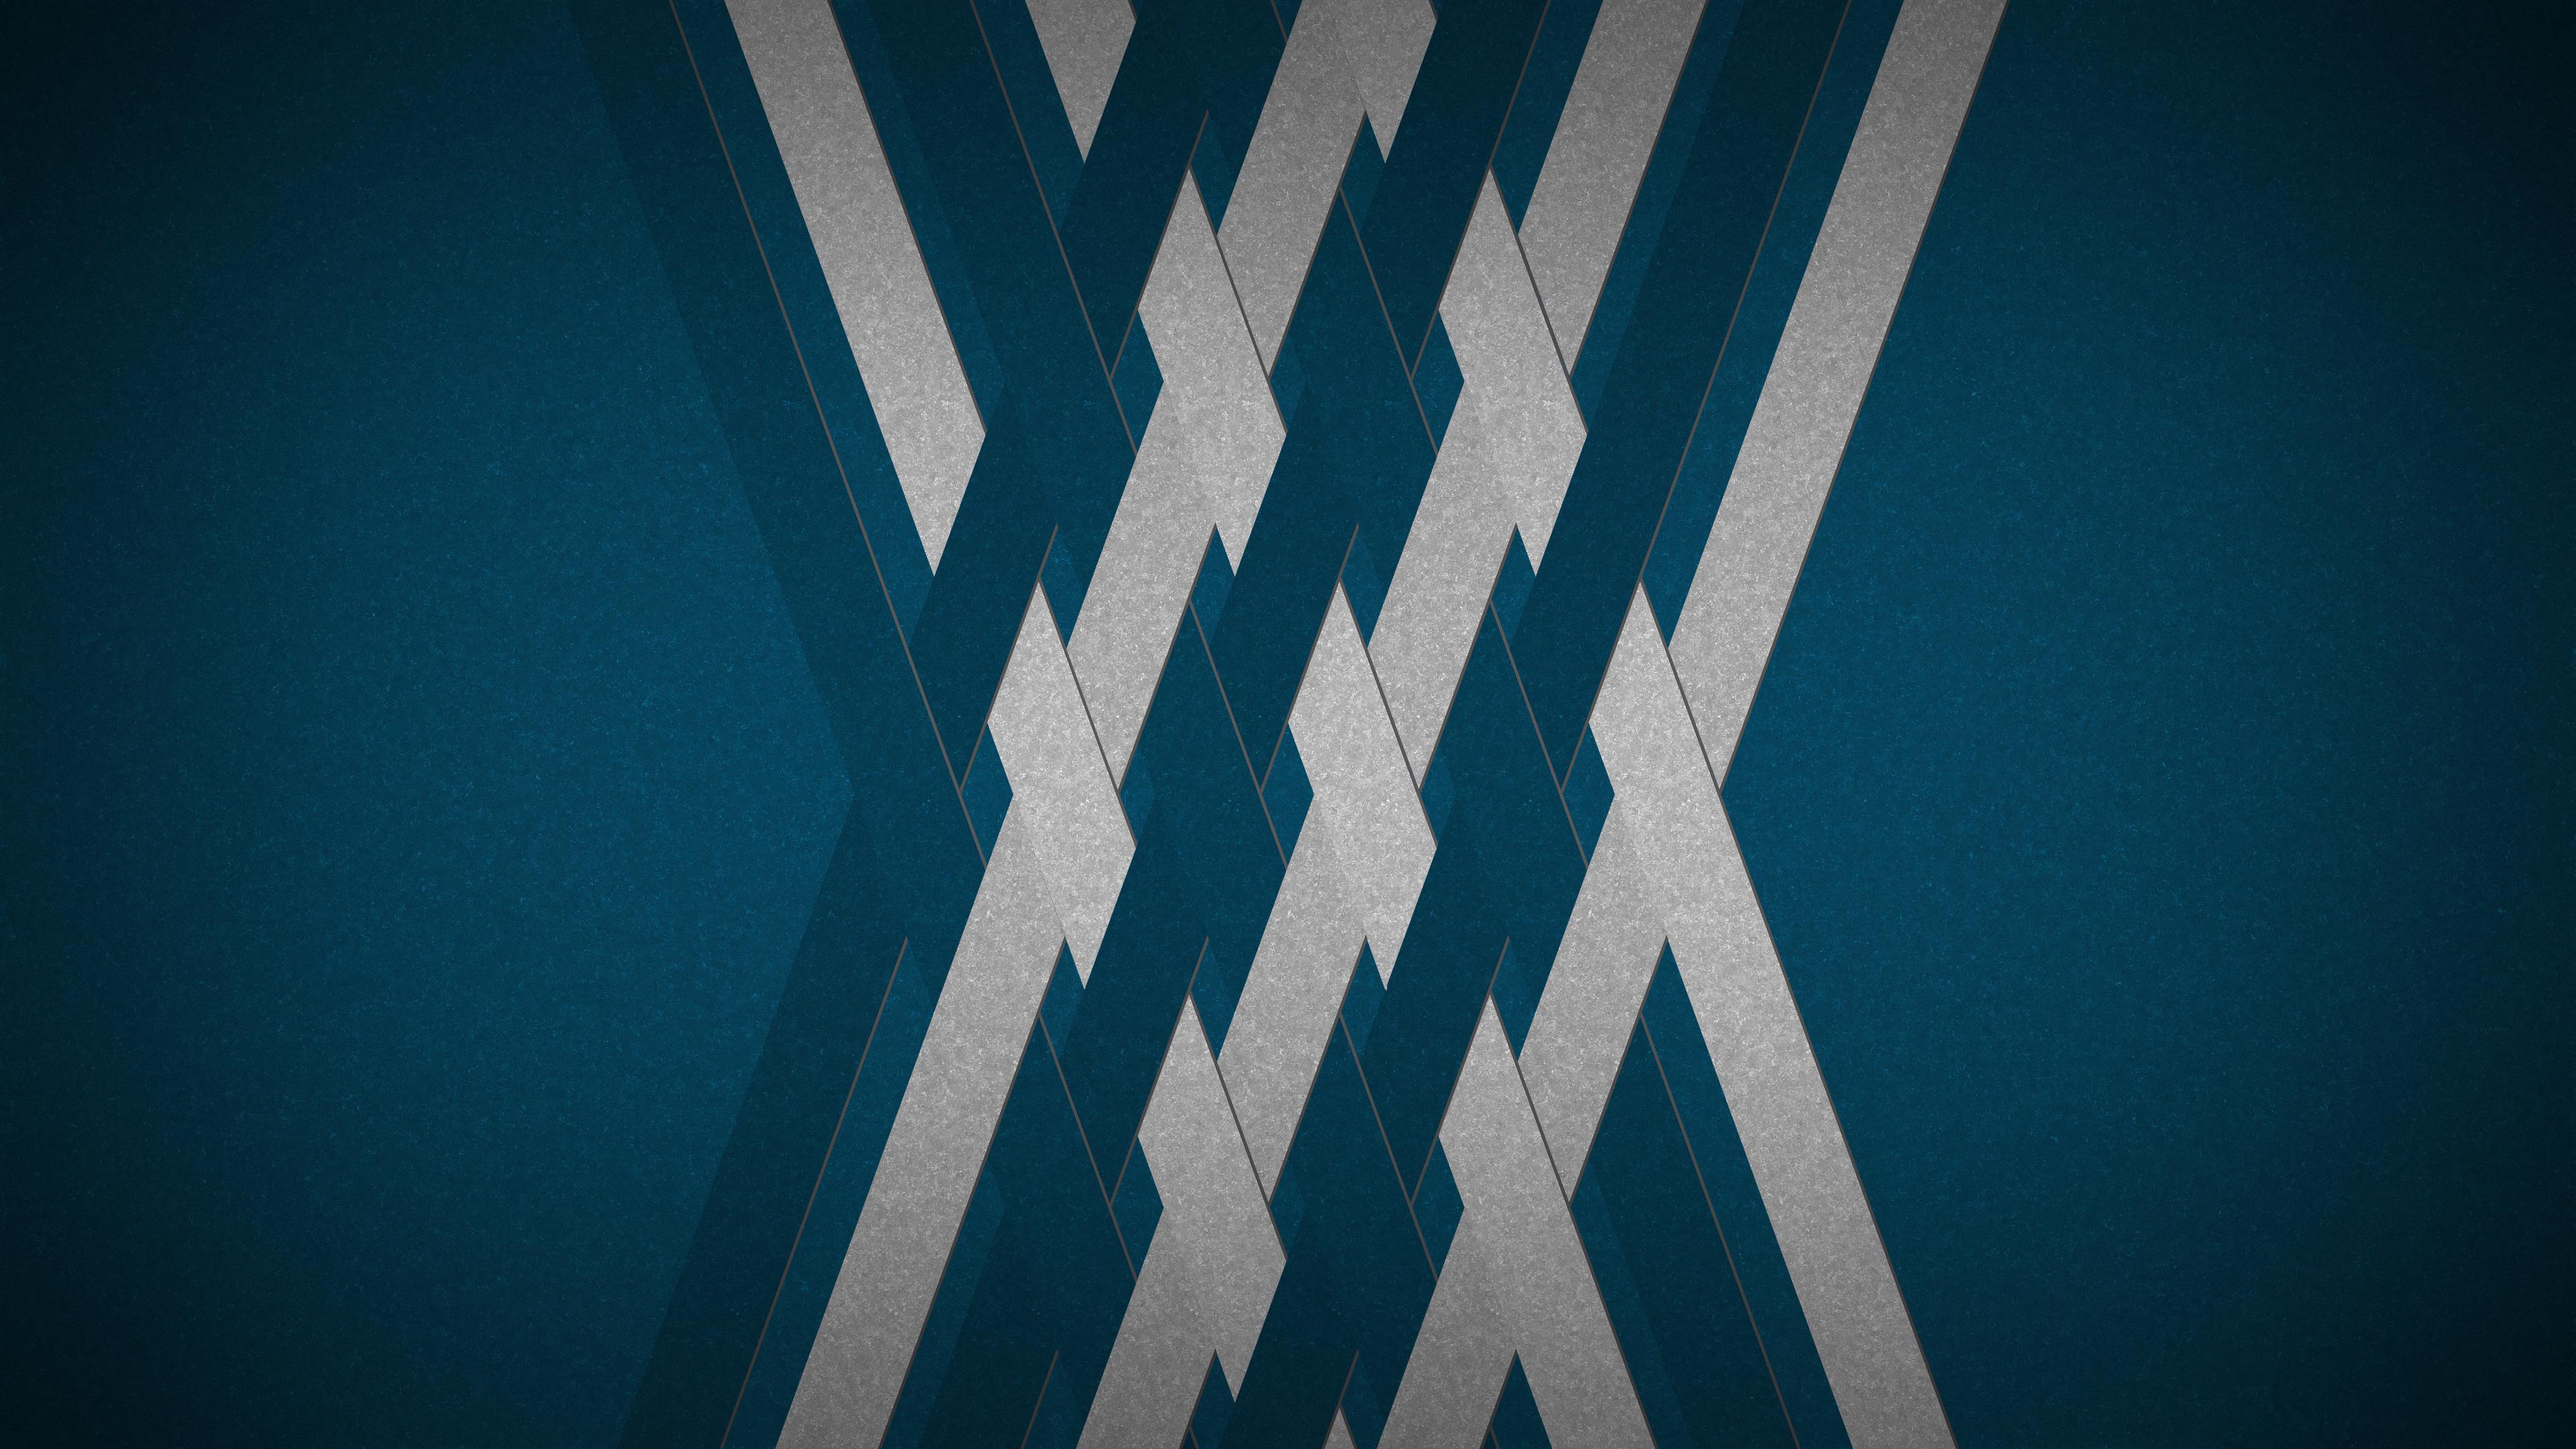 abstract blue cyan lines 1539370757 - Abstract Blue Cyan Lines - shape wallpapers, lines wallpapers, hd-wallpapers, abstract wallpapers, 5k wallpapers, 4k-wallpapers